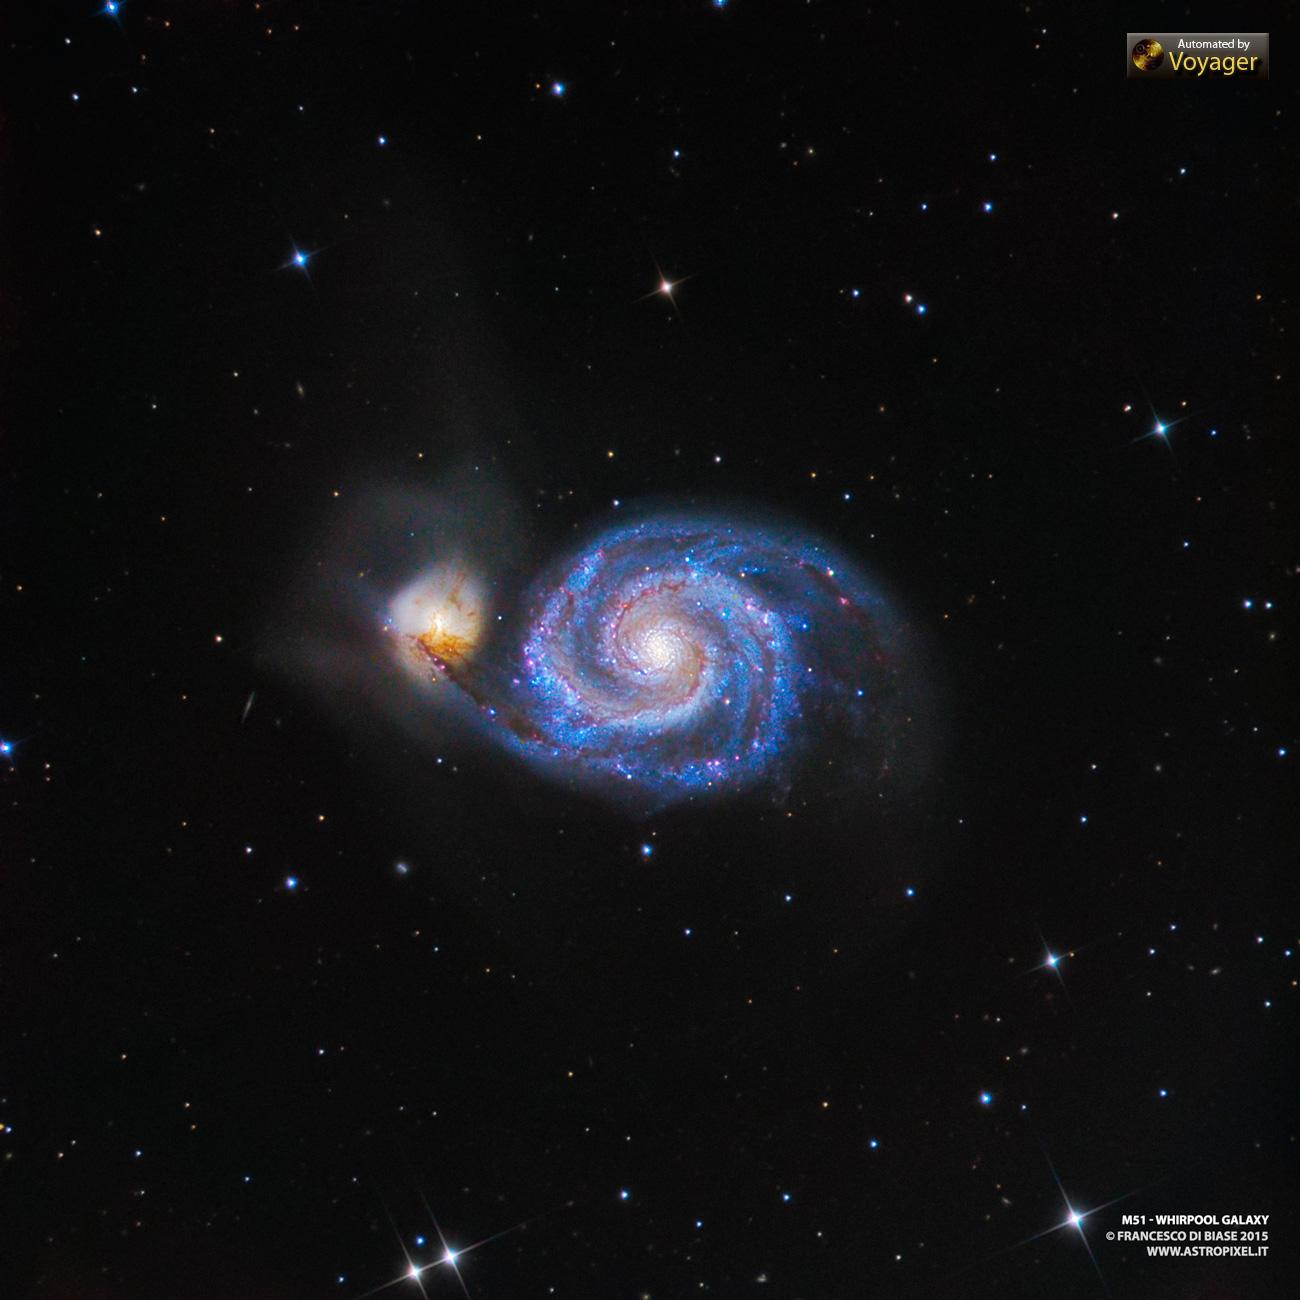 _M51_Voyager